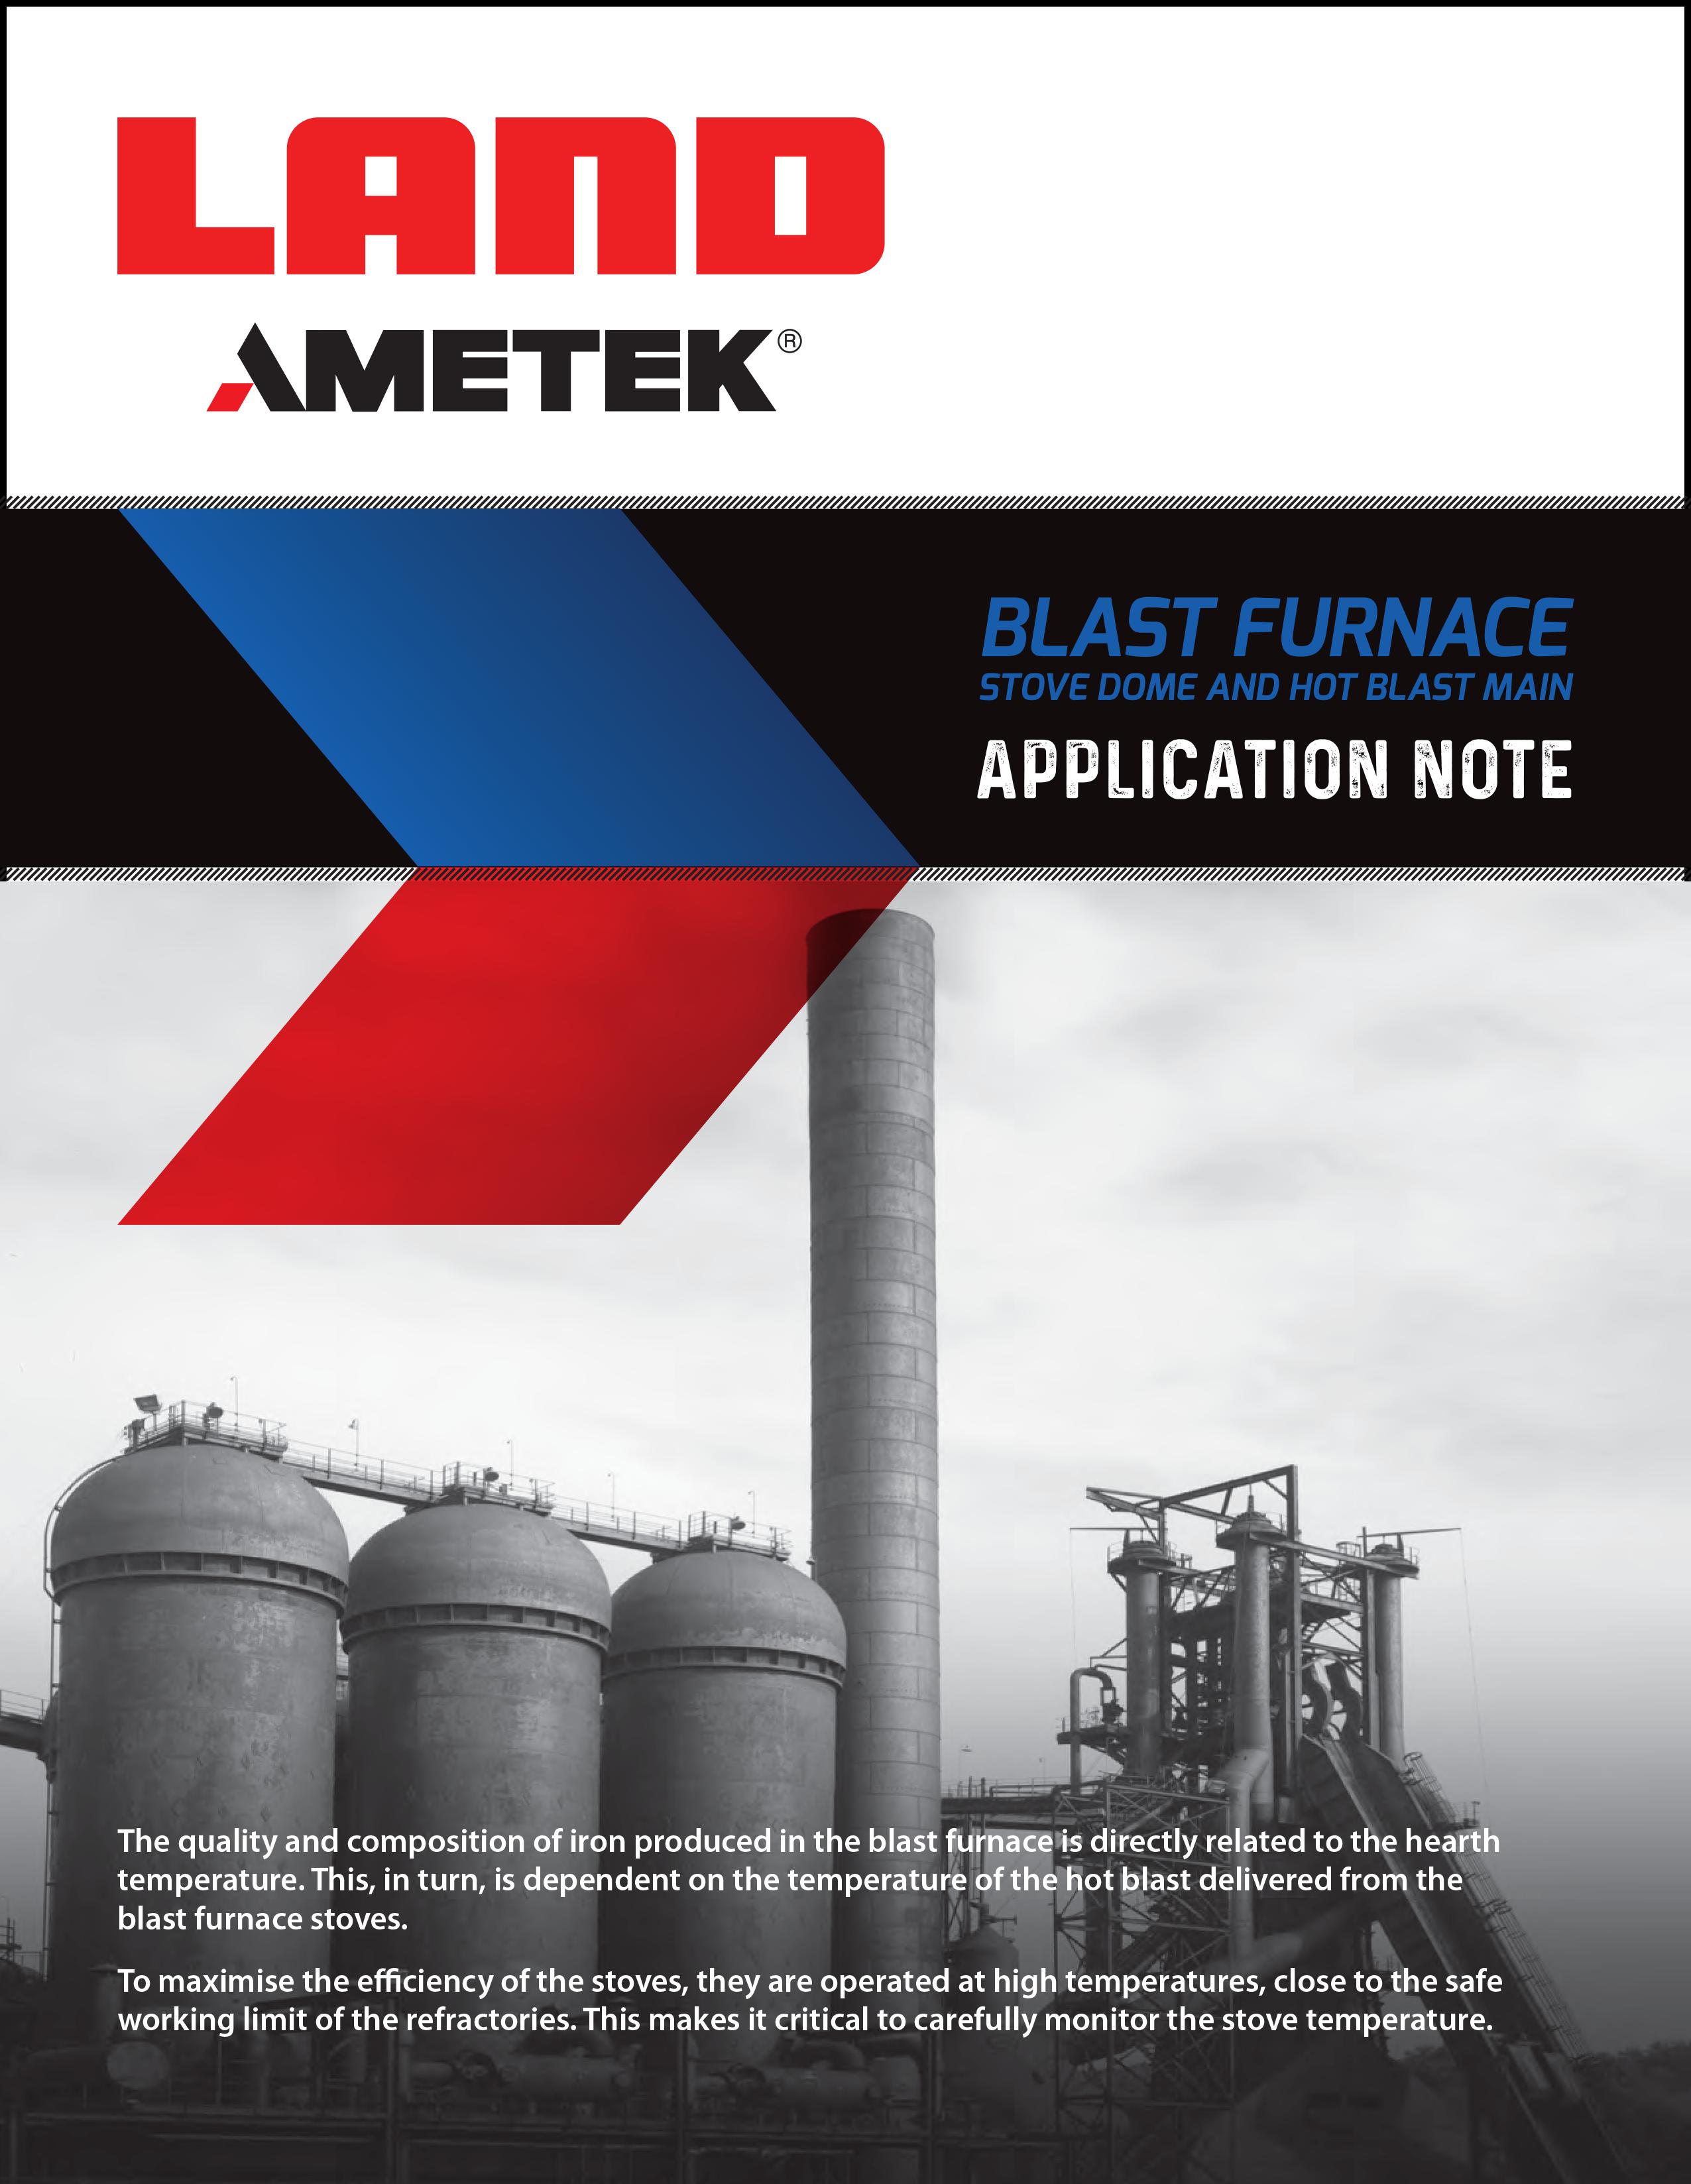 Application Note - Blast Furnace